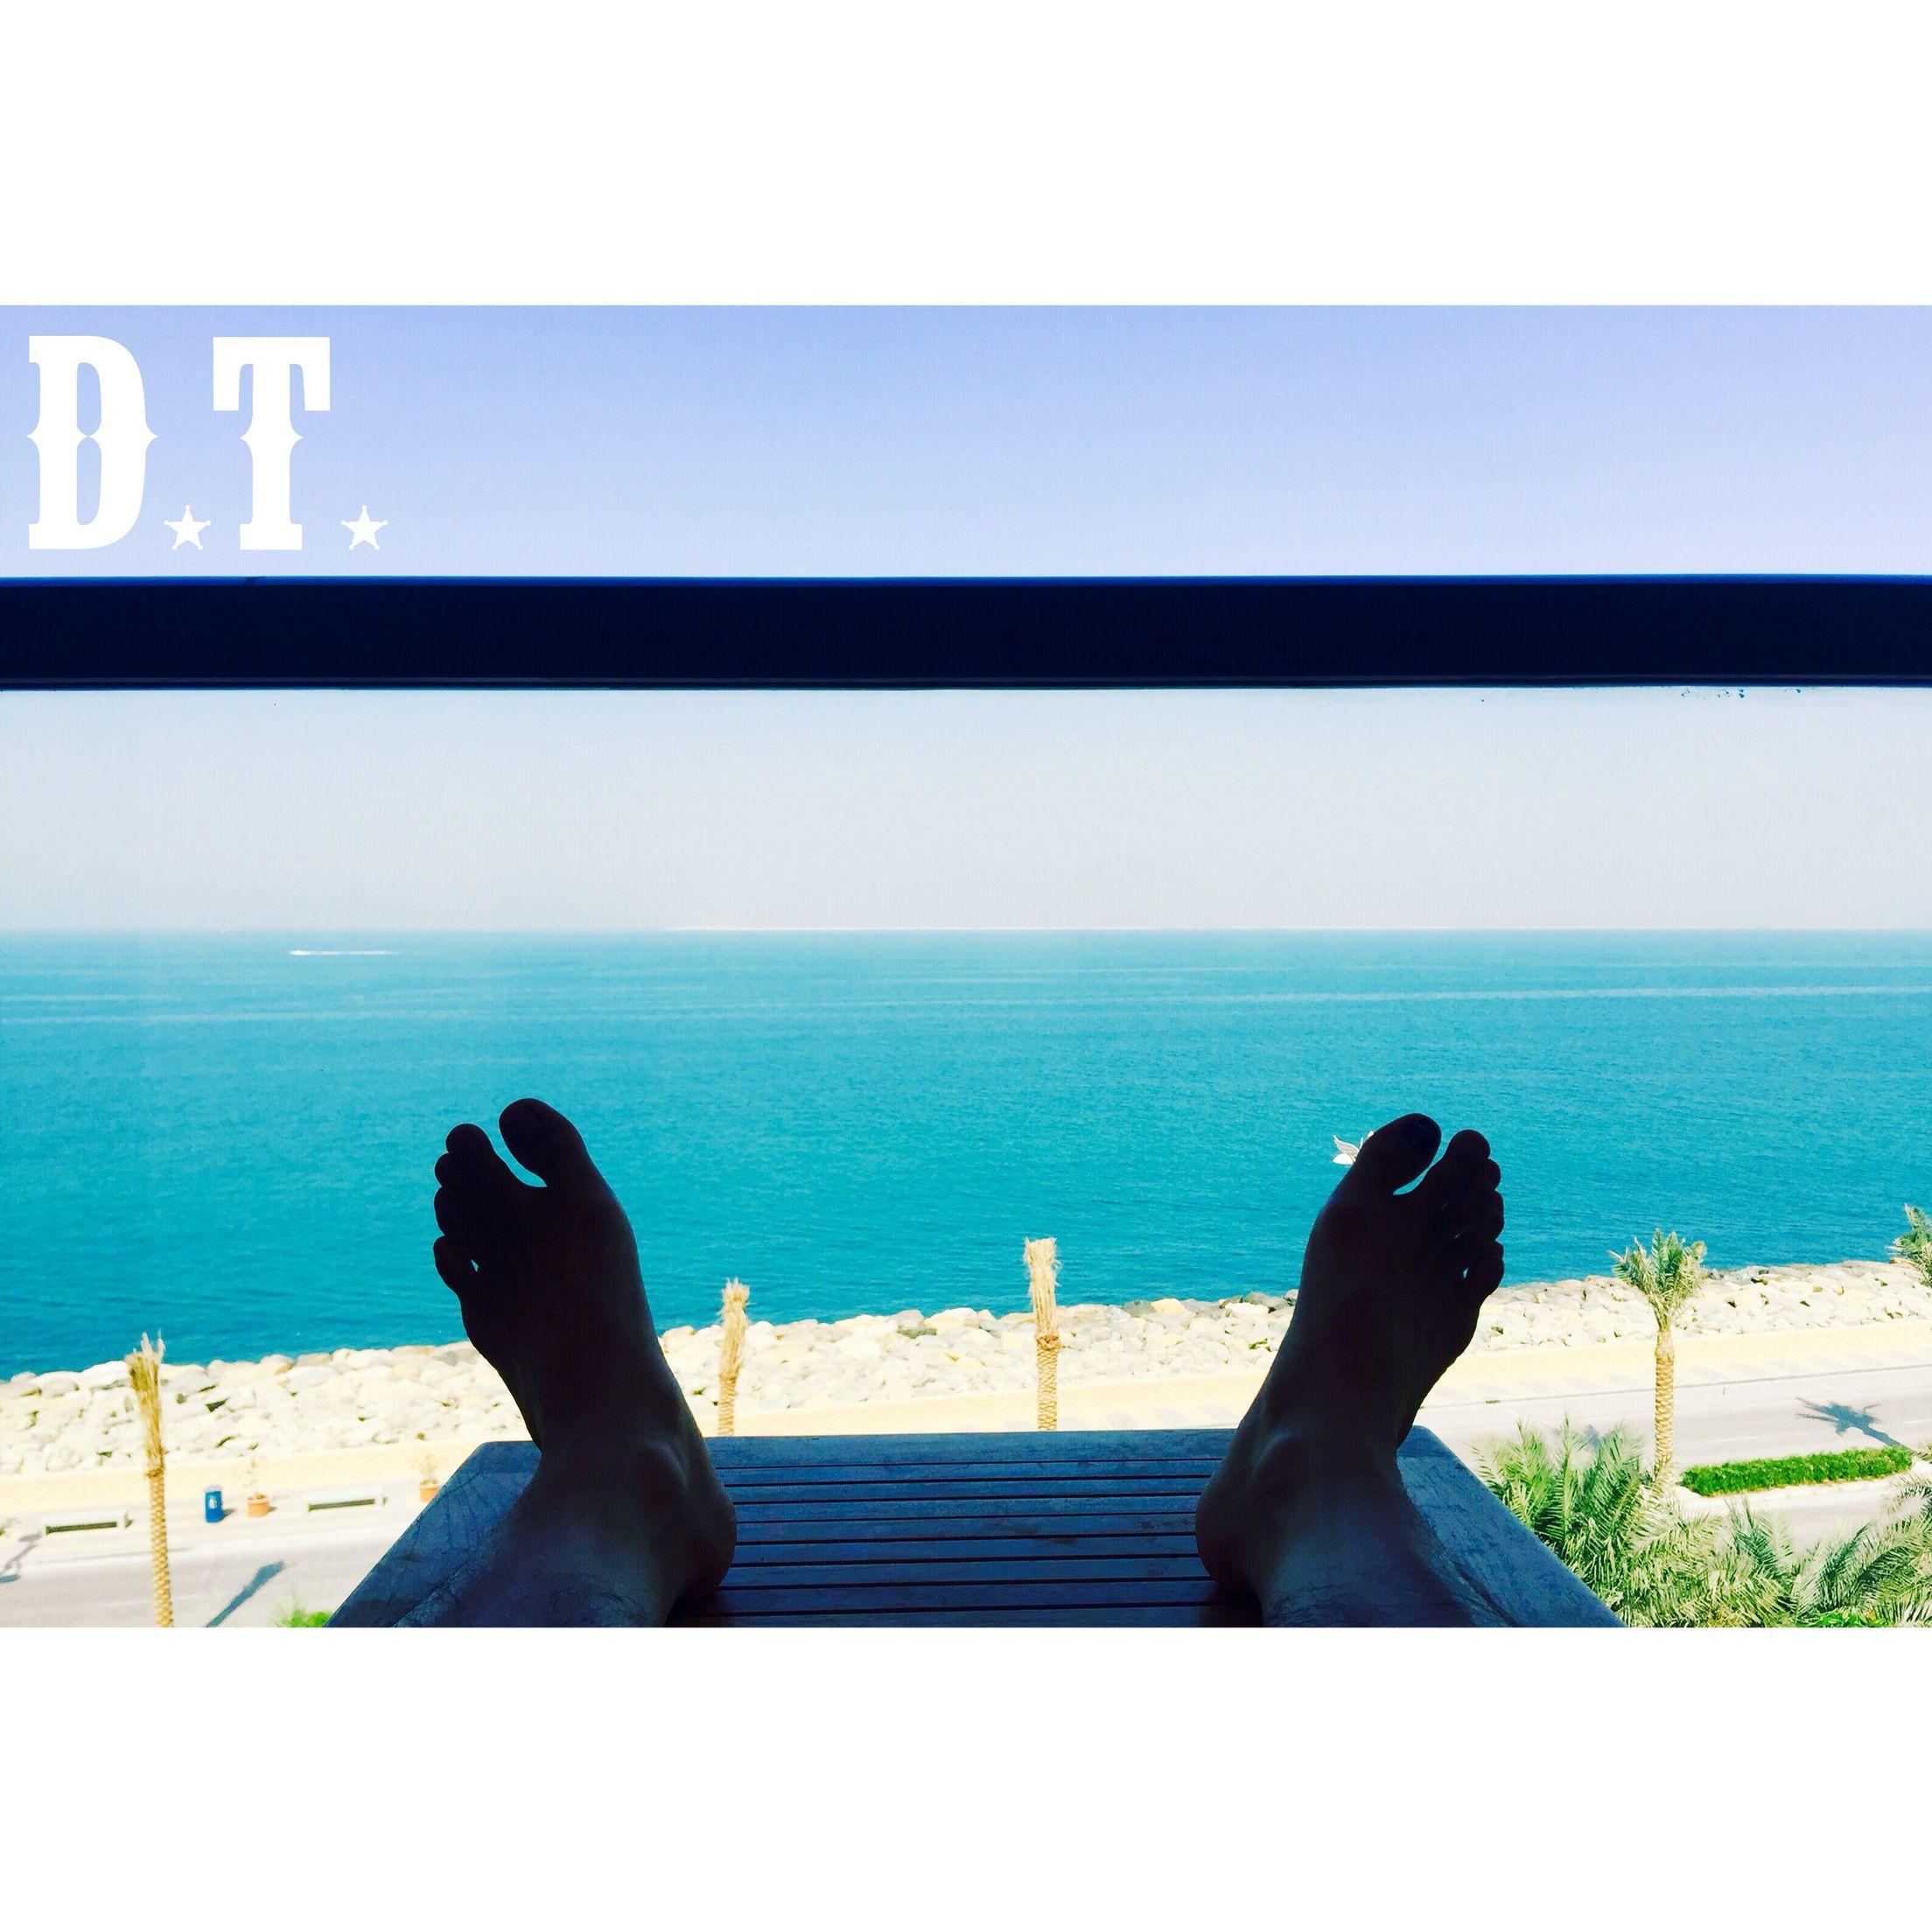 Morning  #DT #唐禹哲 #Dubai